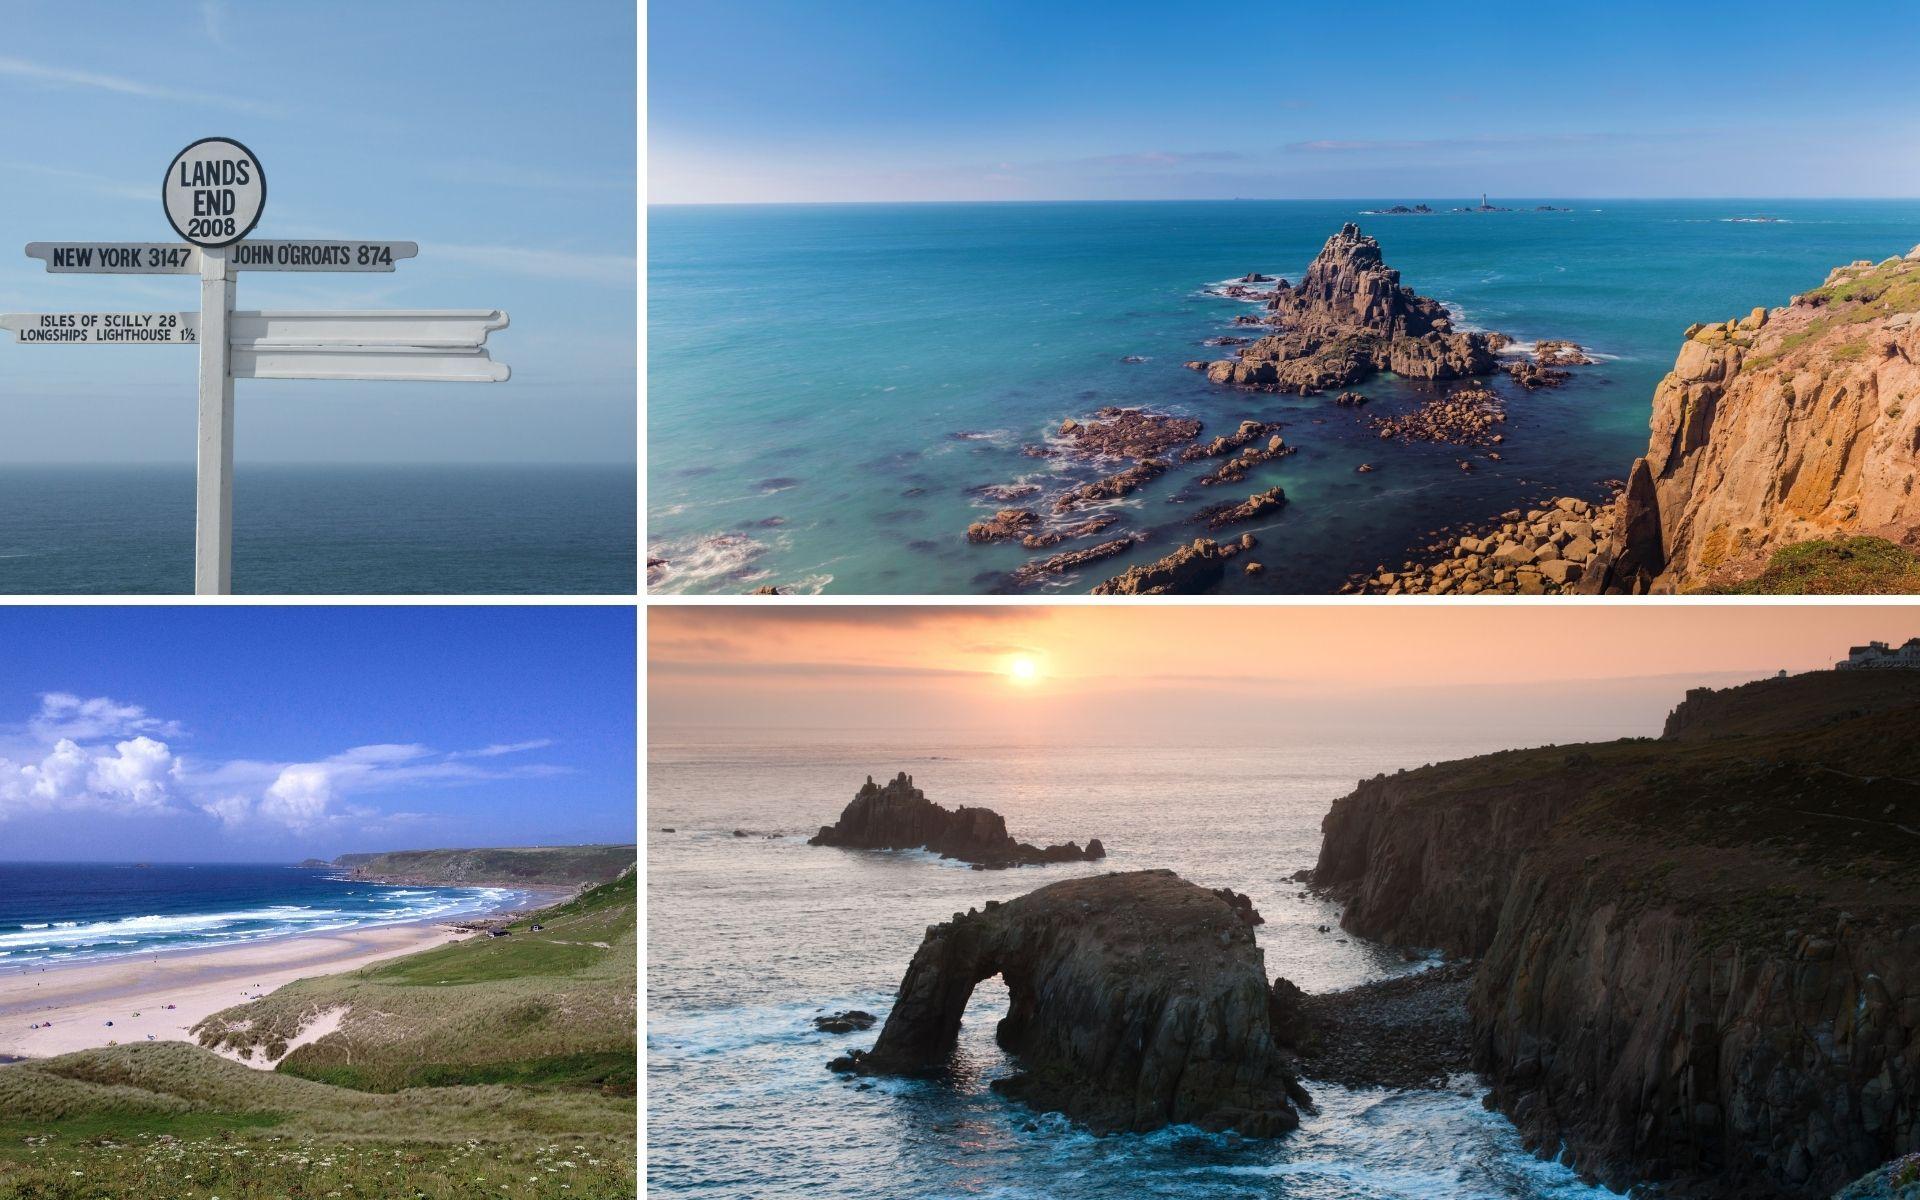 Land's End & Senne Cornwall